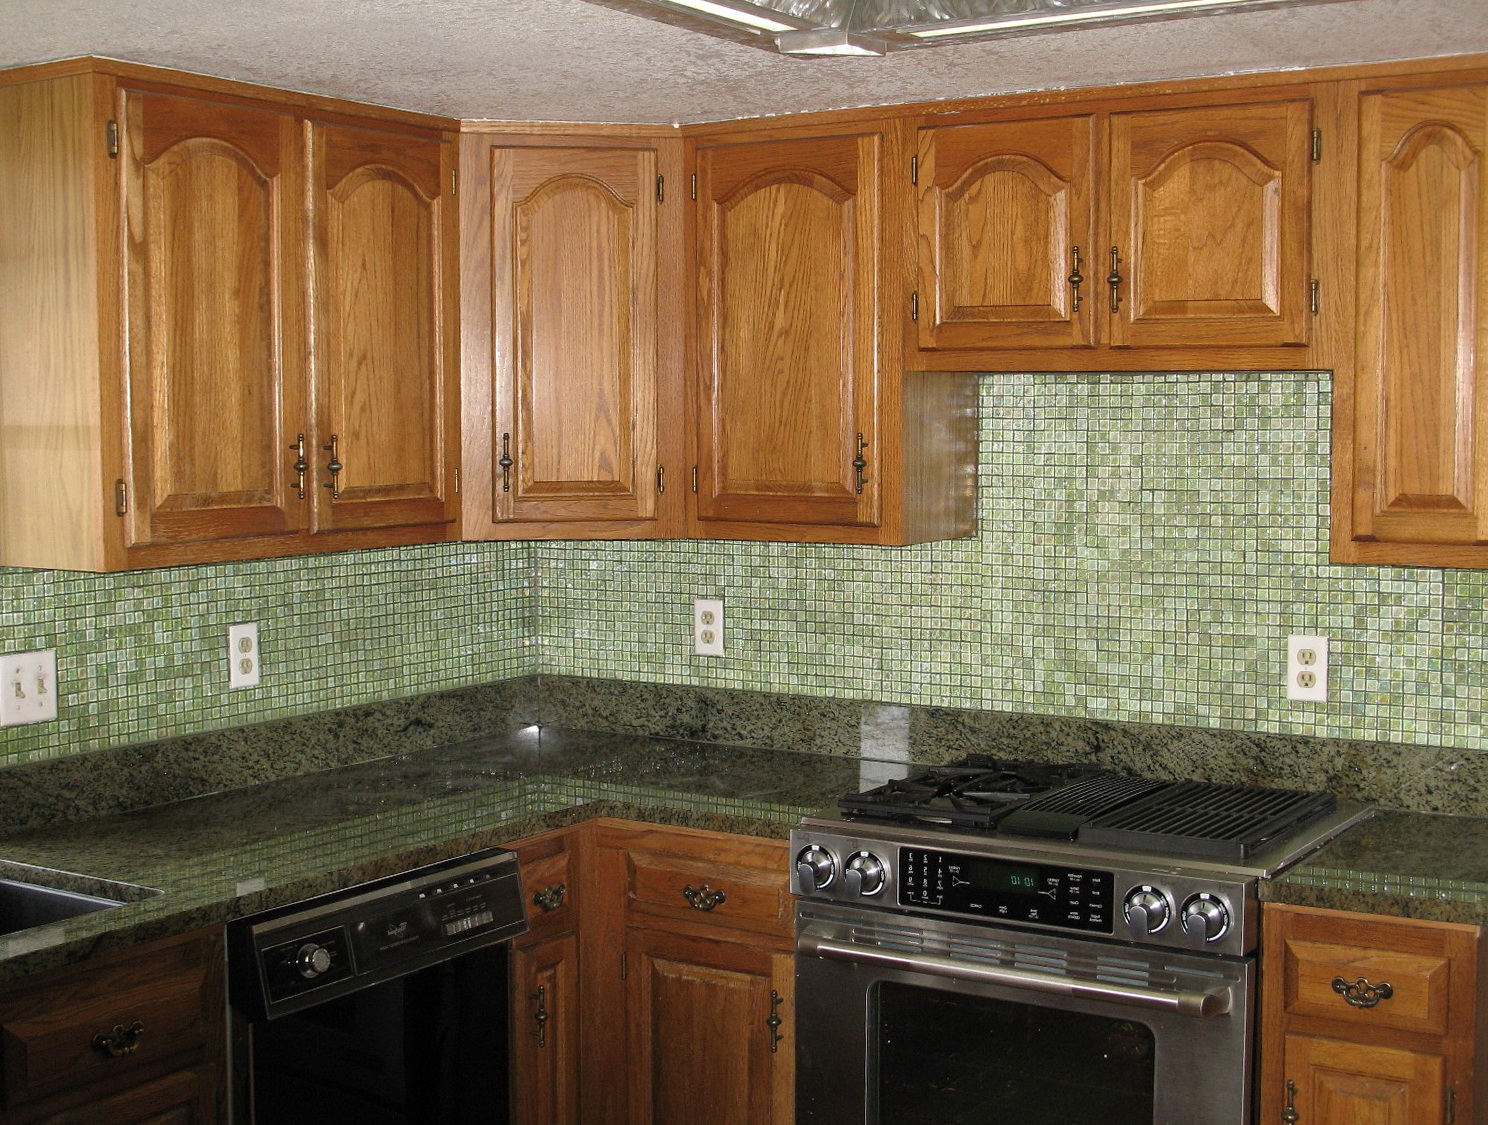 Kitchen Tile Ideas 2013